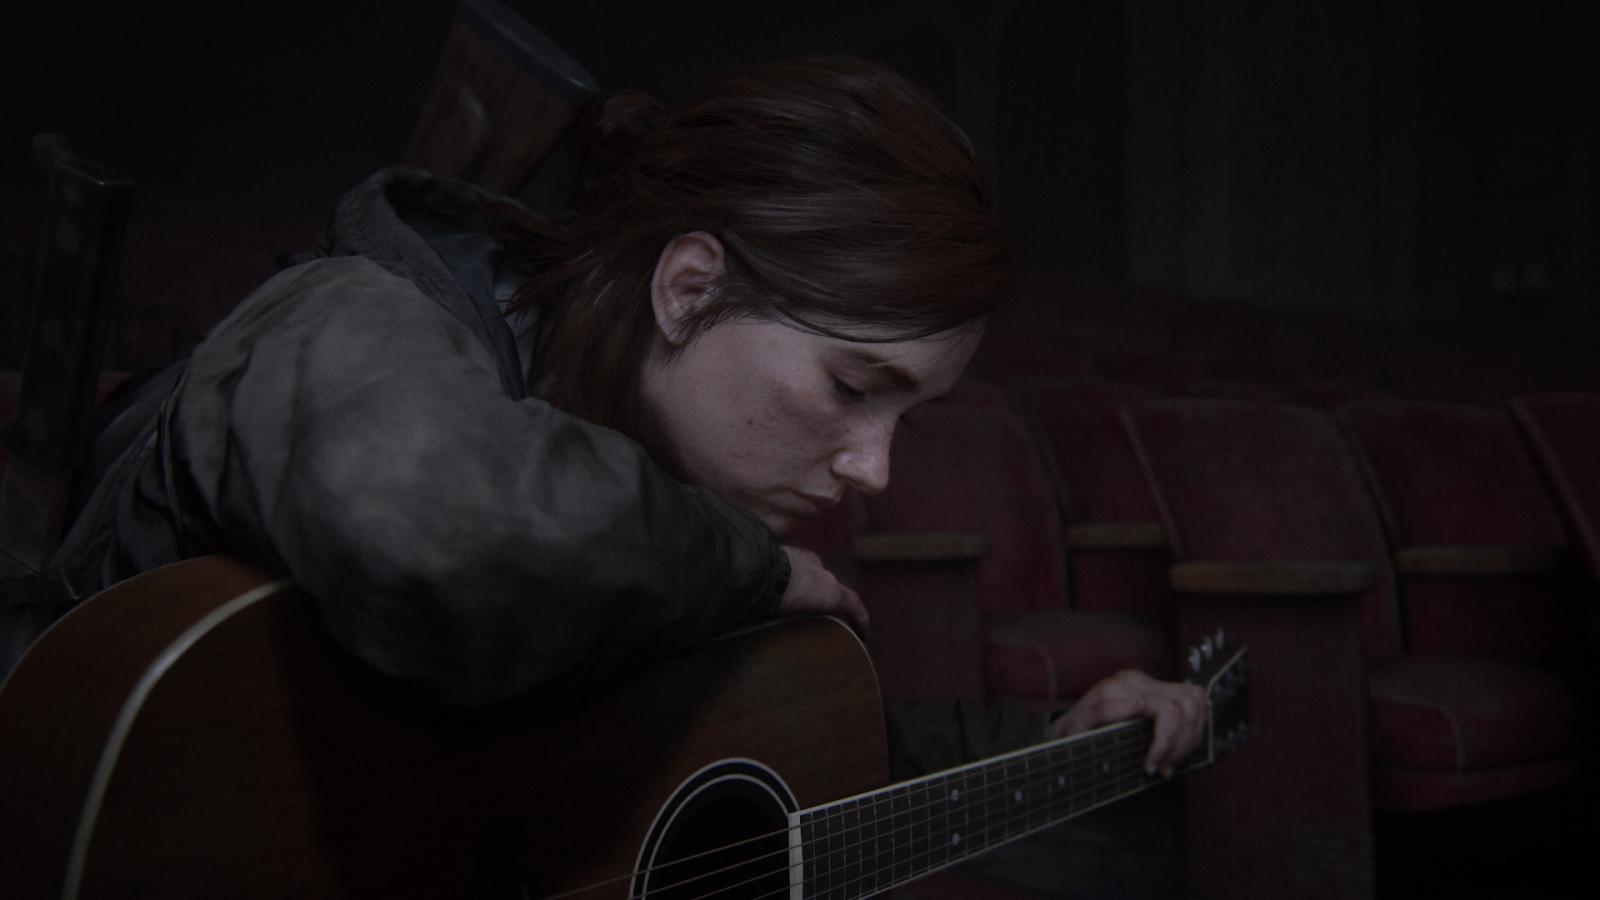 Wallpaper : The Last of Us 2, Ellie 1920x1080 - Hanako - 1901451 - HD Wallpapers - WallHere